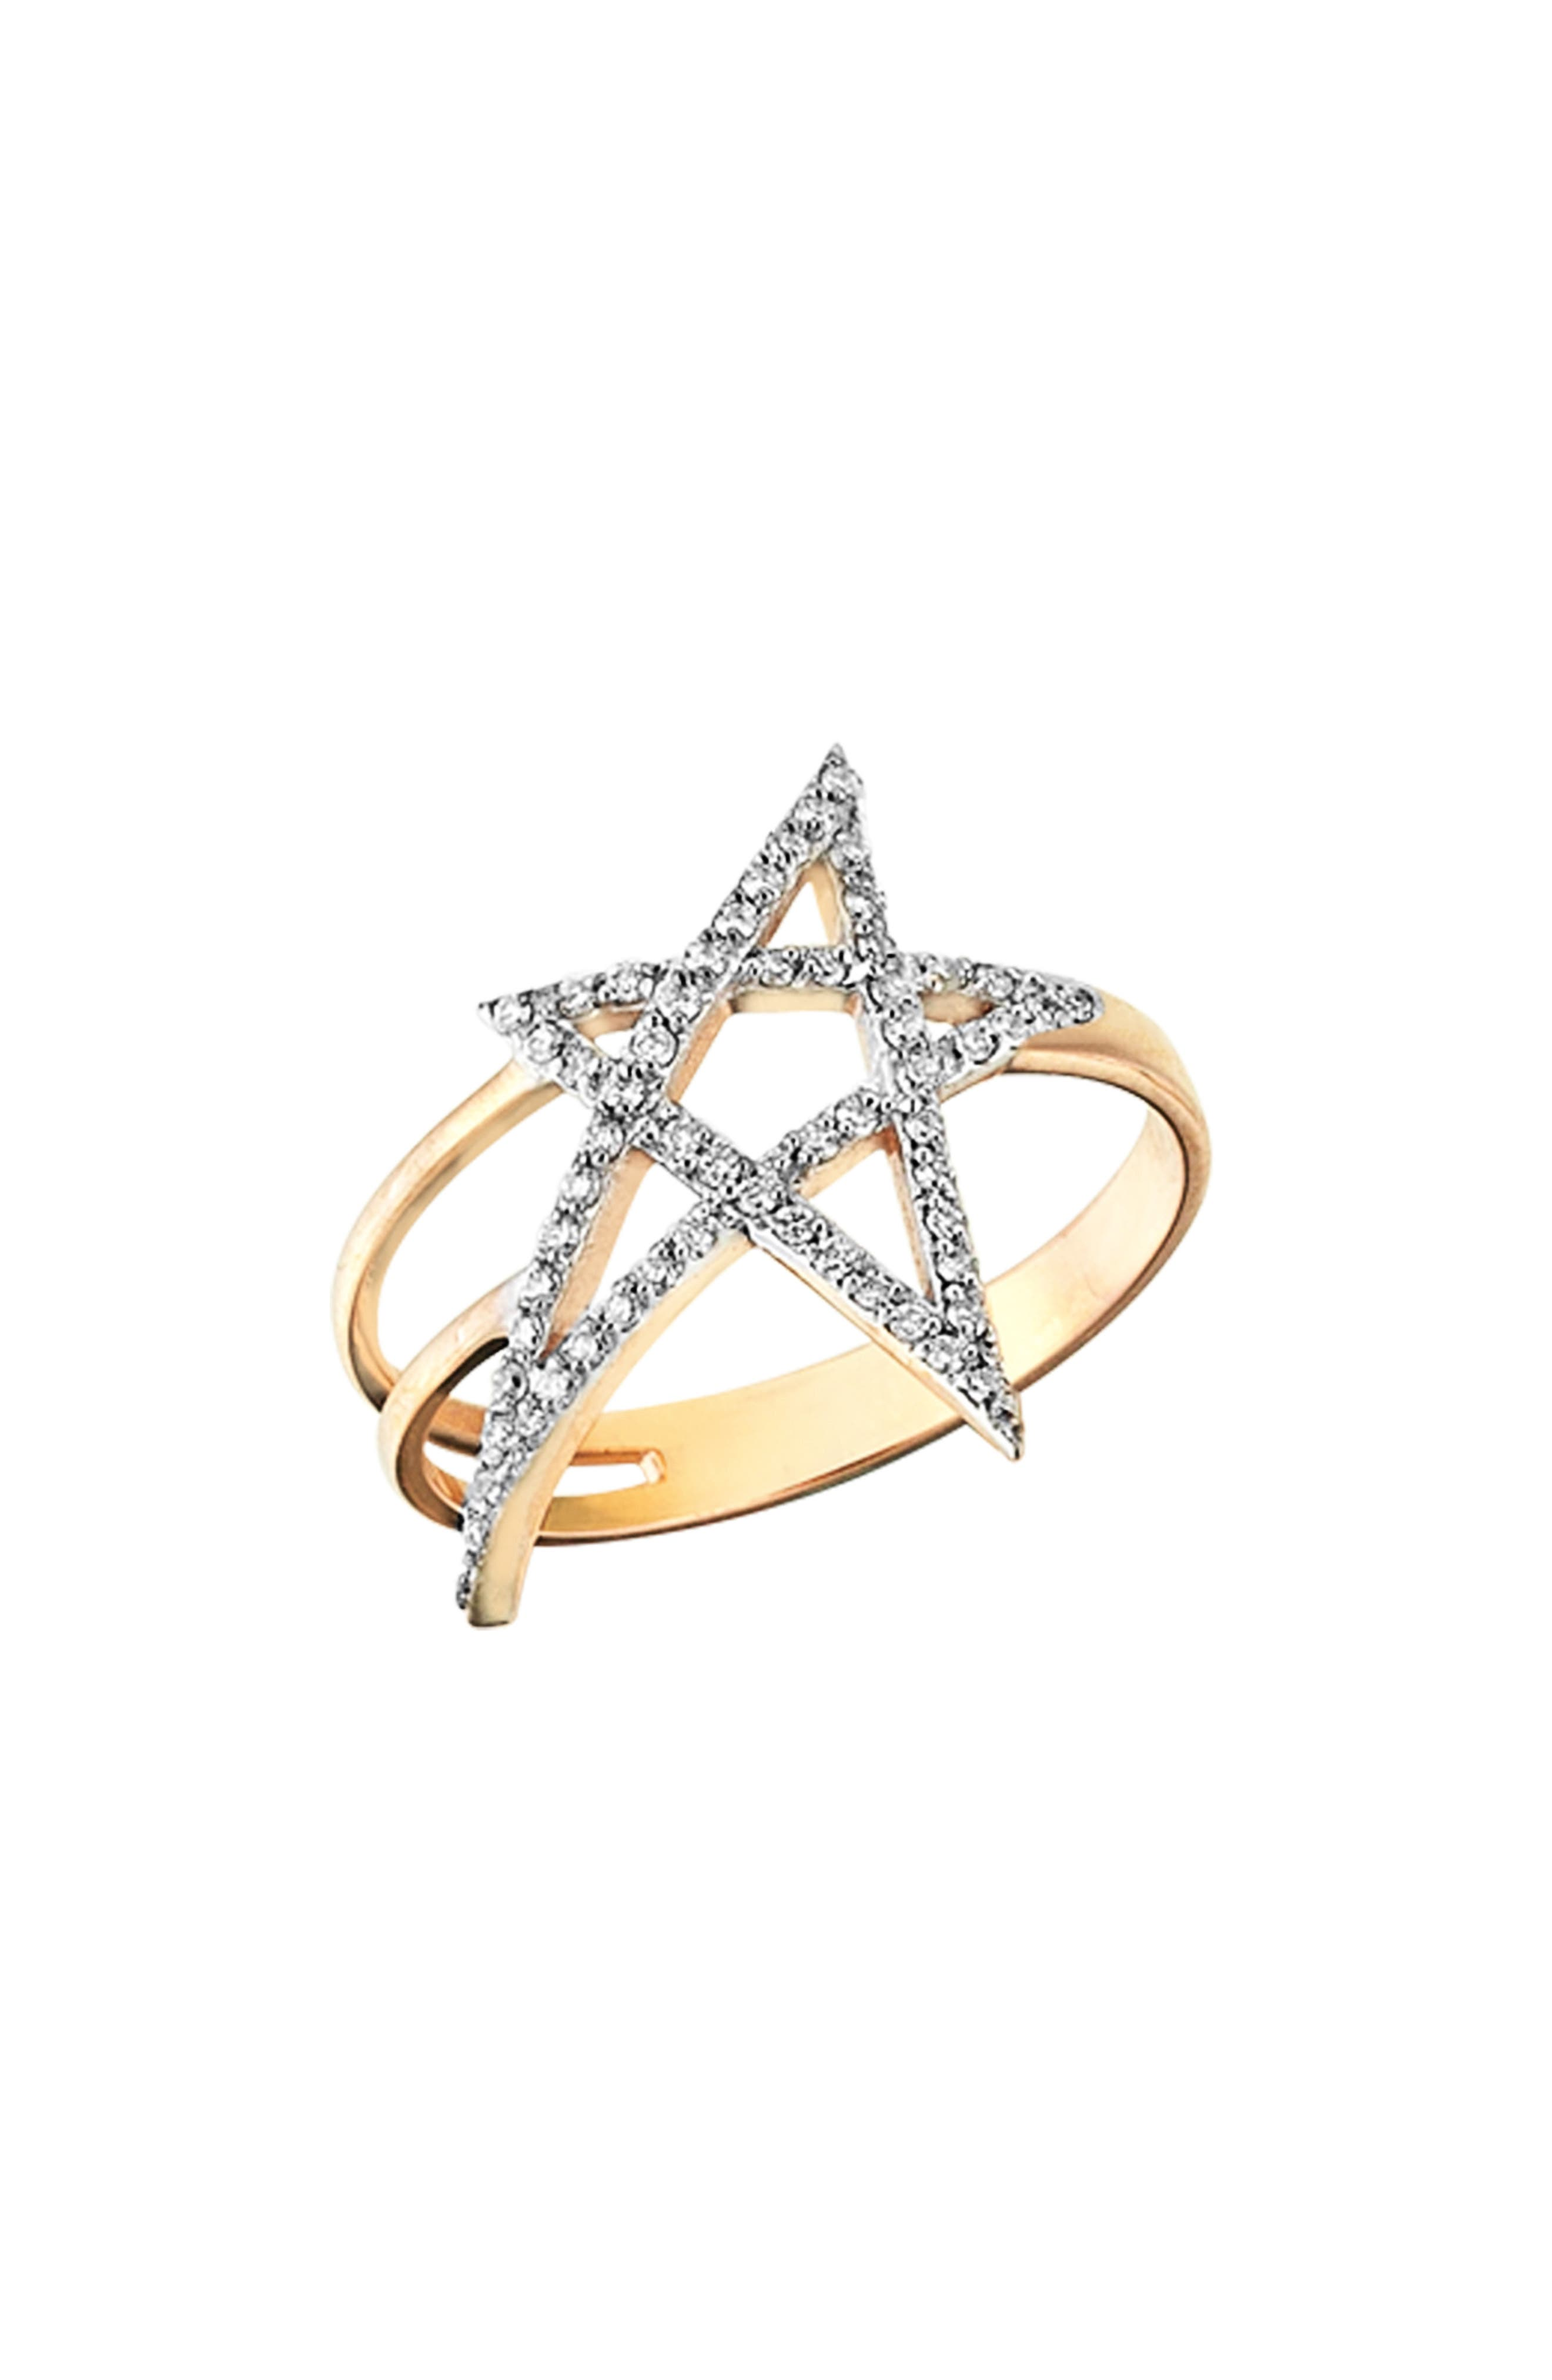 Main Image - Kismet by Milka Struck Doodle Star Diamond Ring